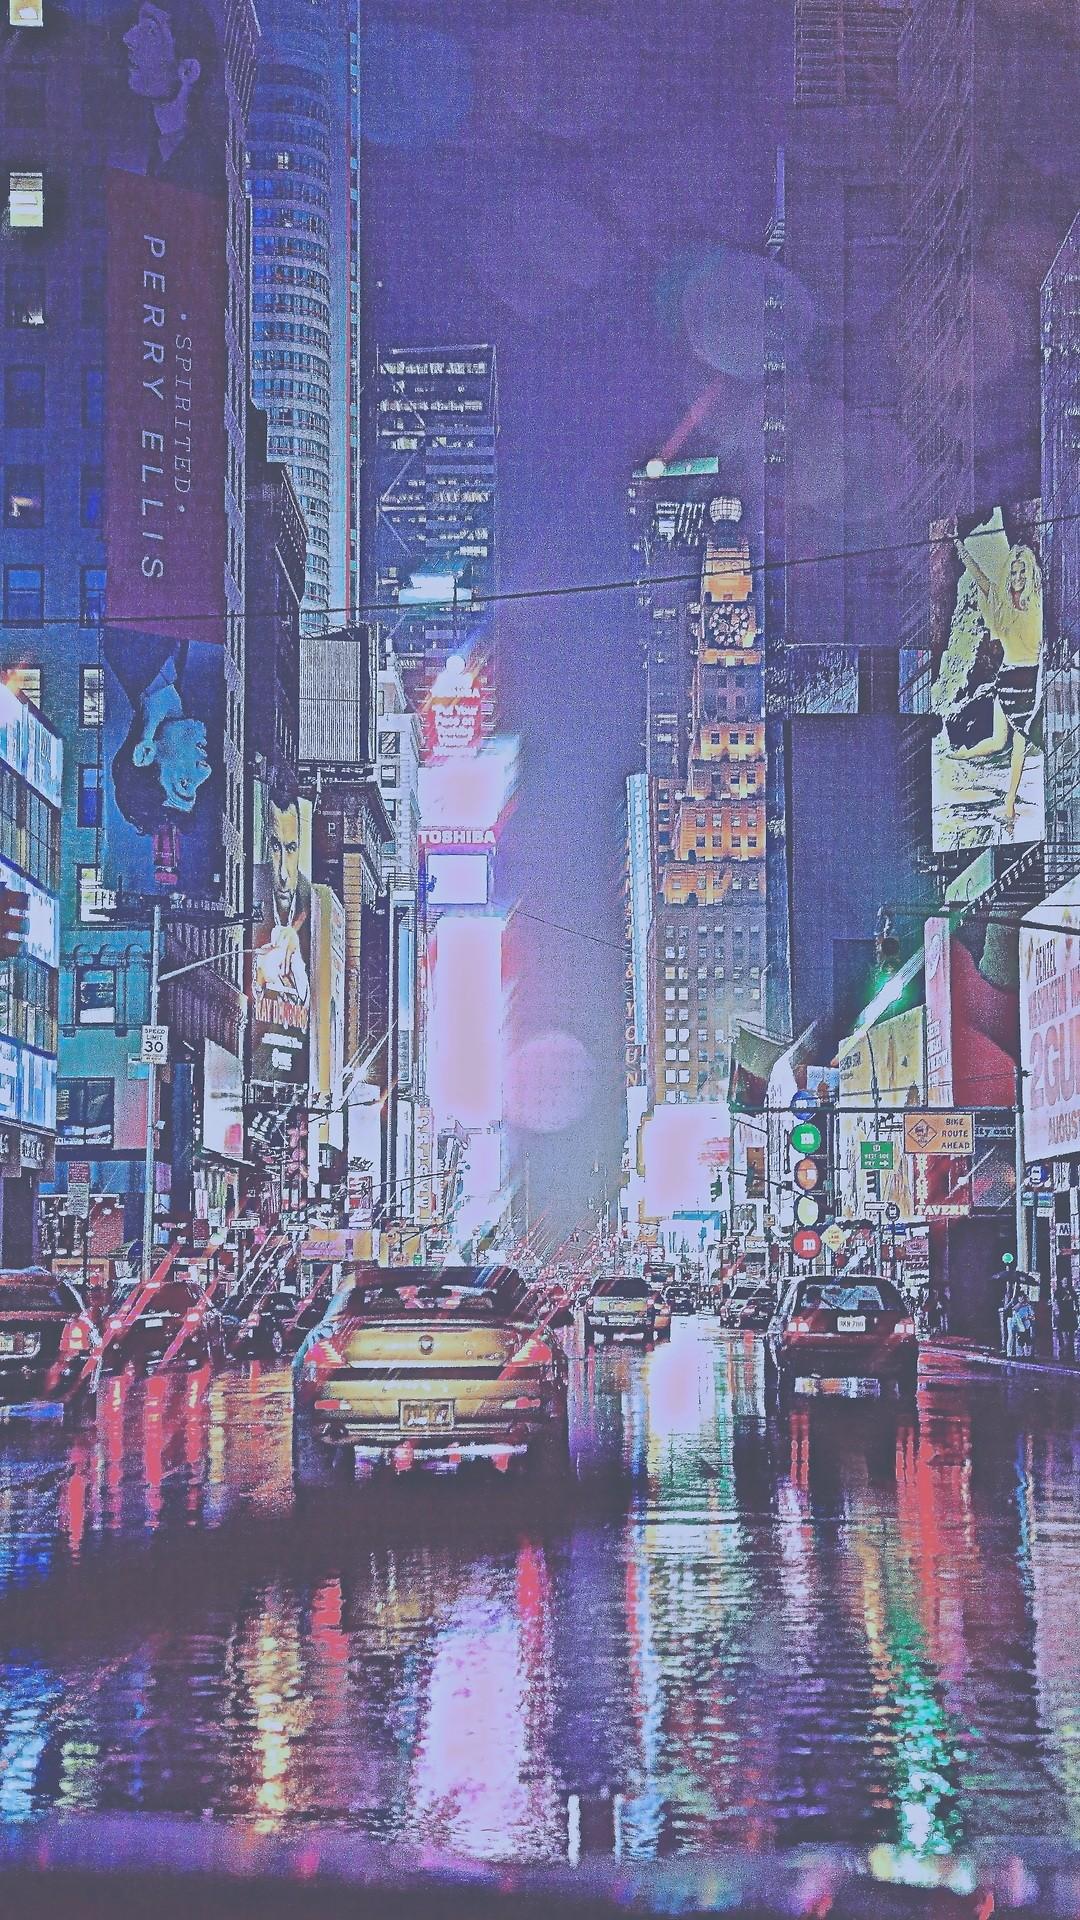 photography art vintage dream cars NYC city rain Magic new york new york  city cityscape dreaming colorfull NY Manhattan david magical newyor.